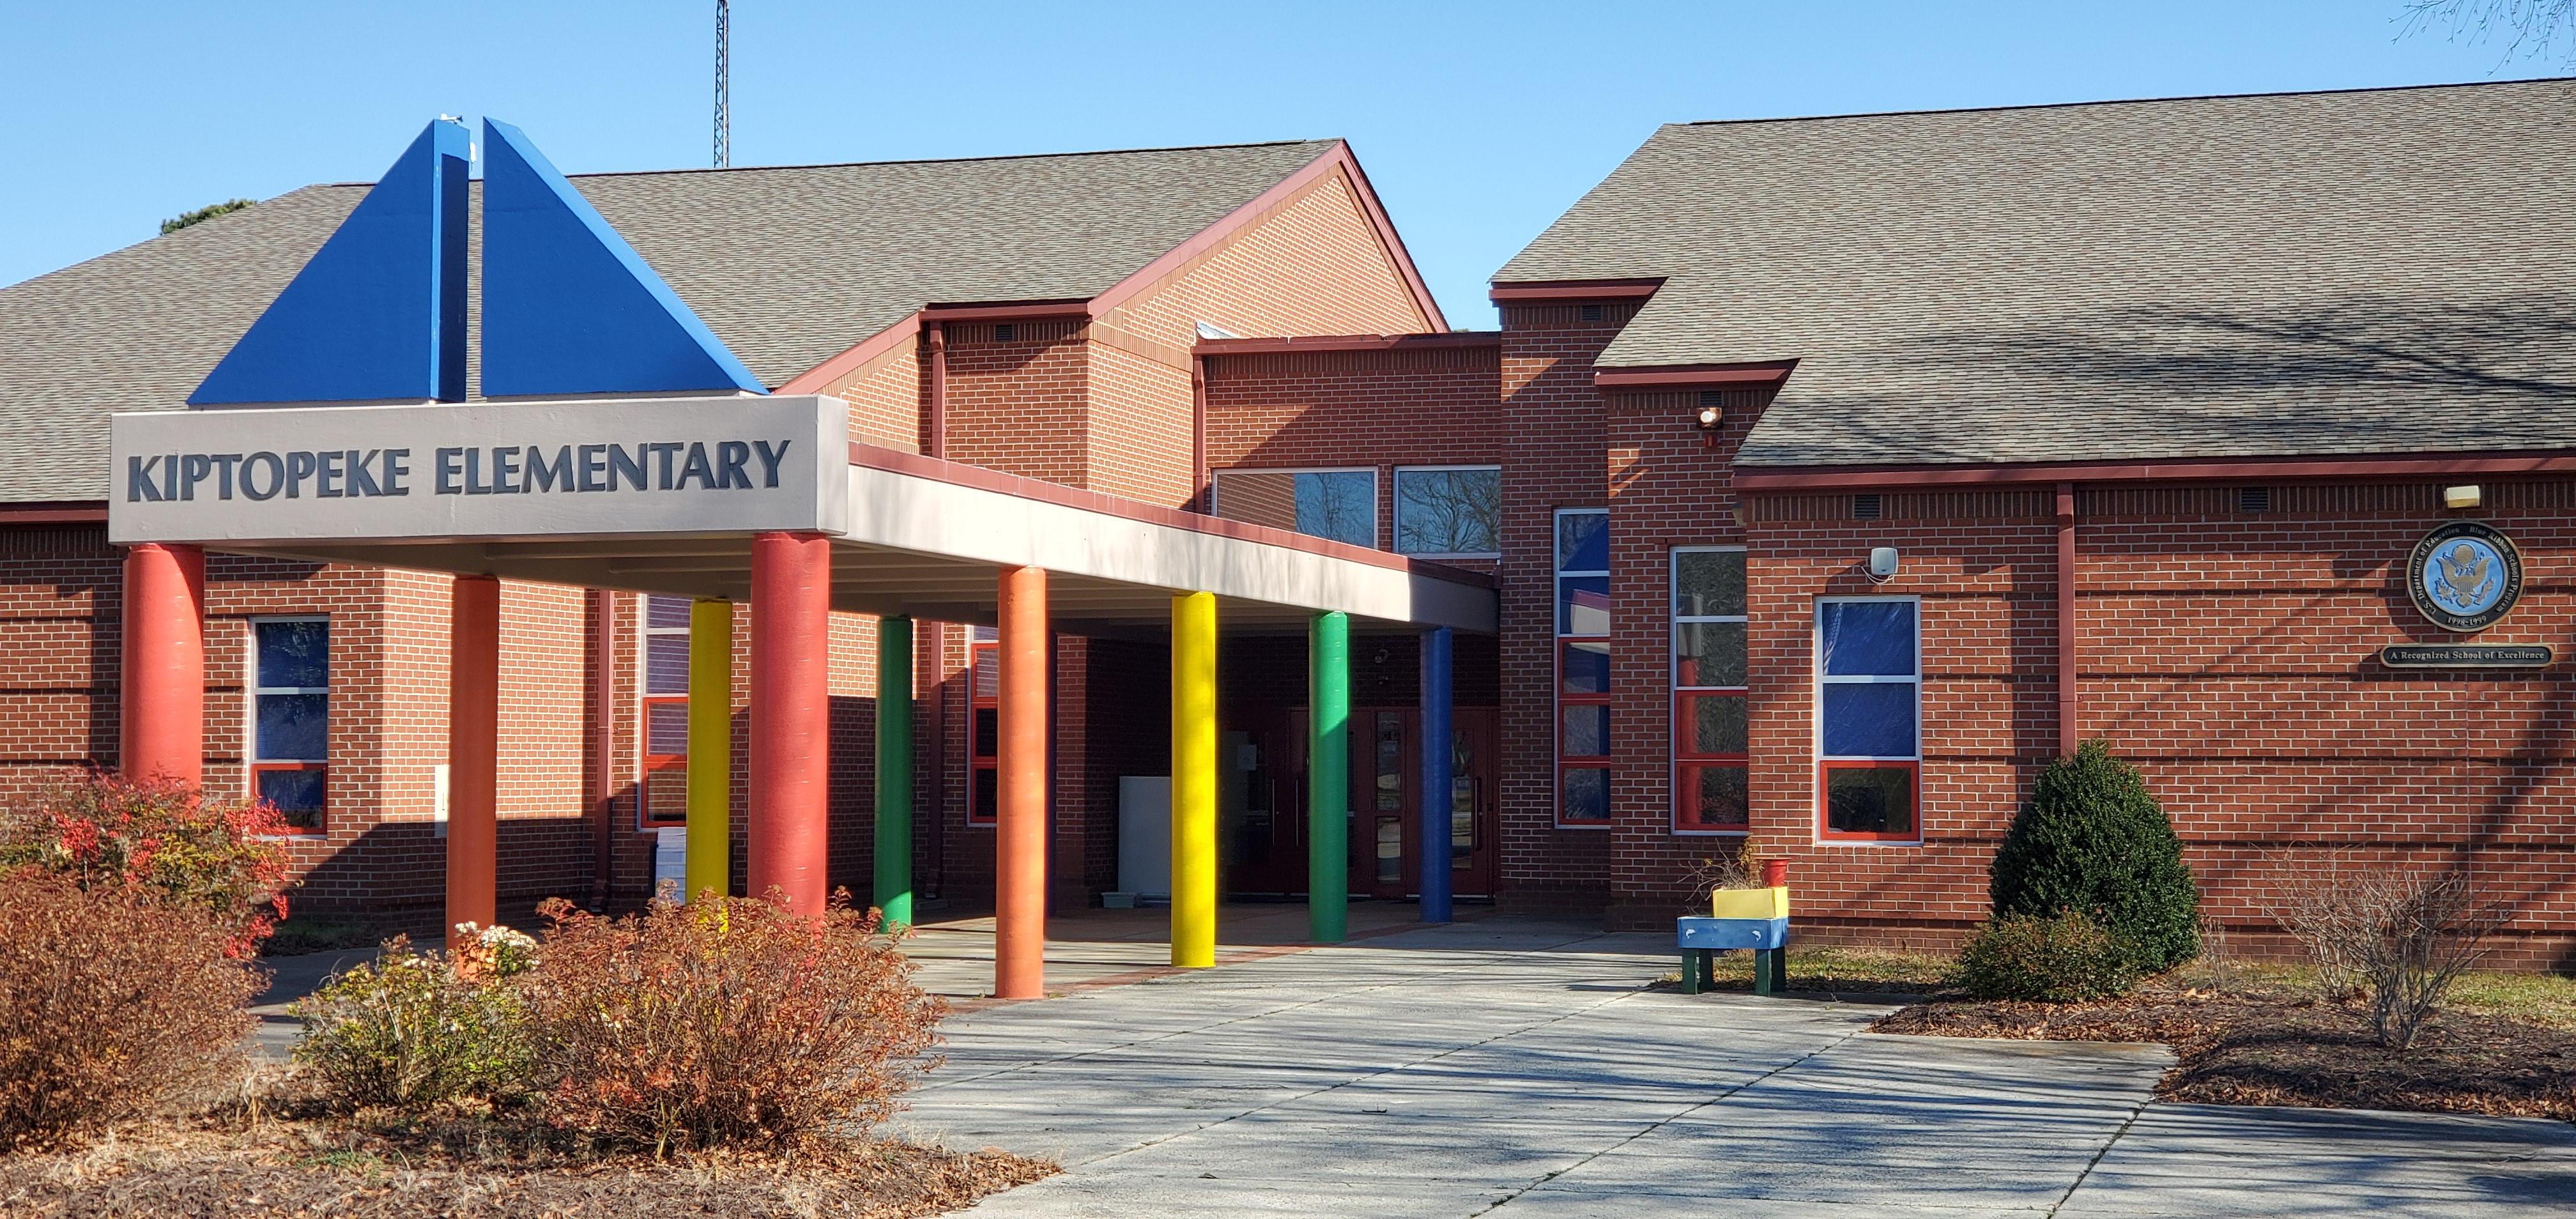 Kiptopeke Elementary